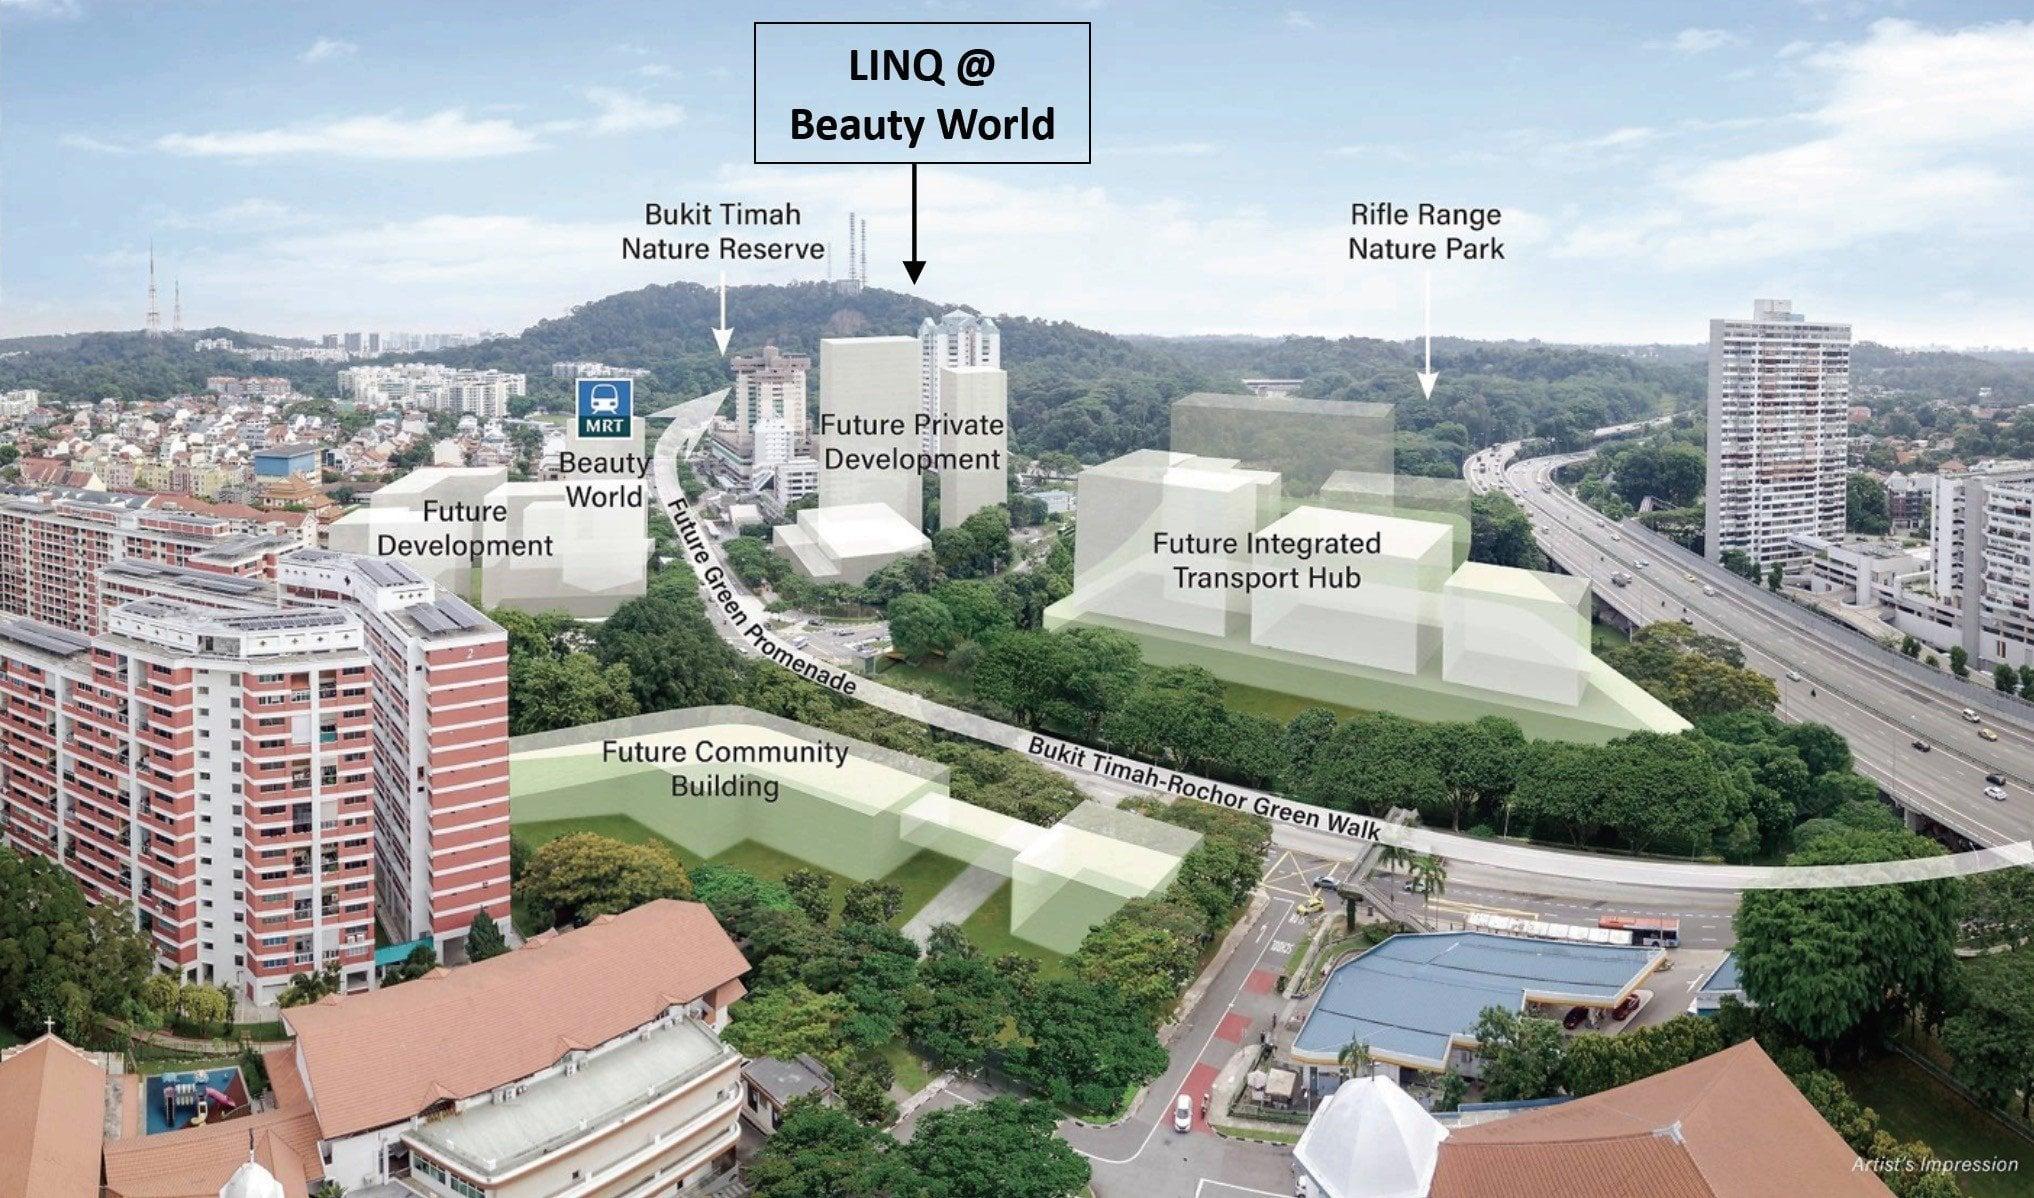 Linq Beauty World - future map